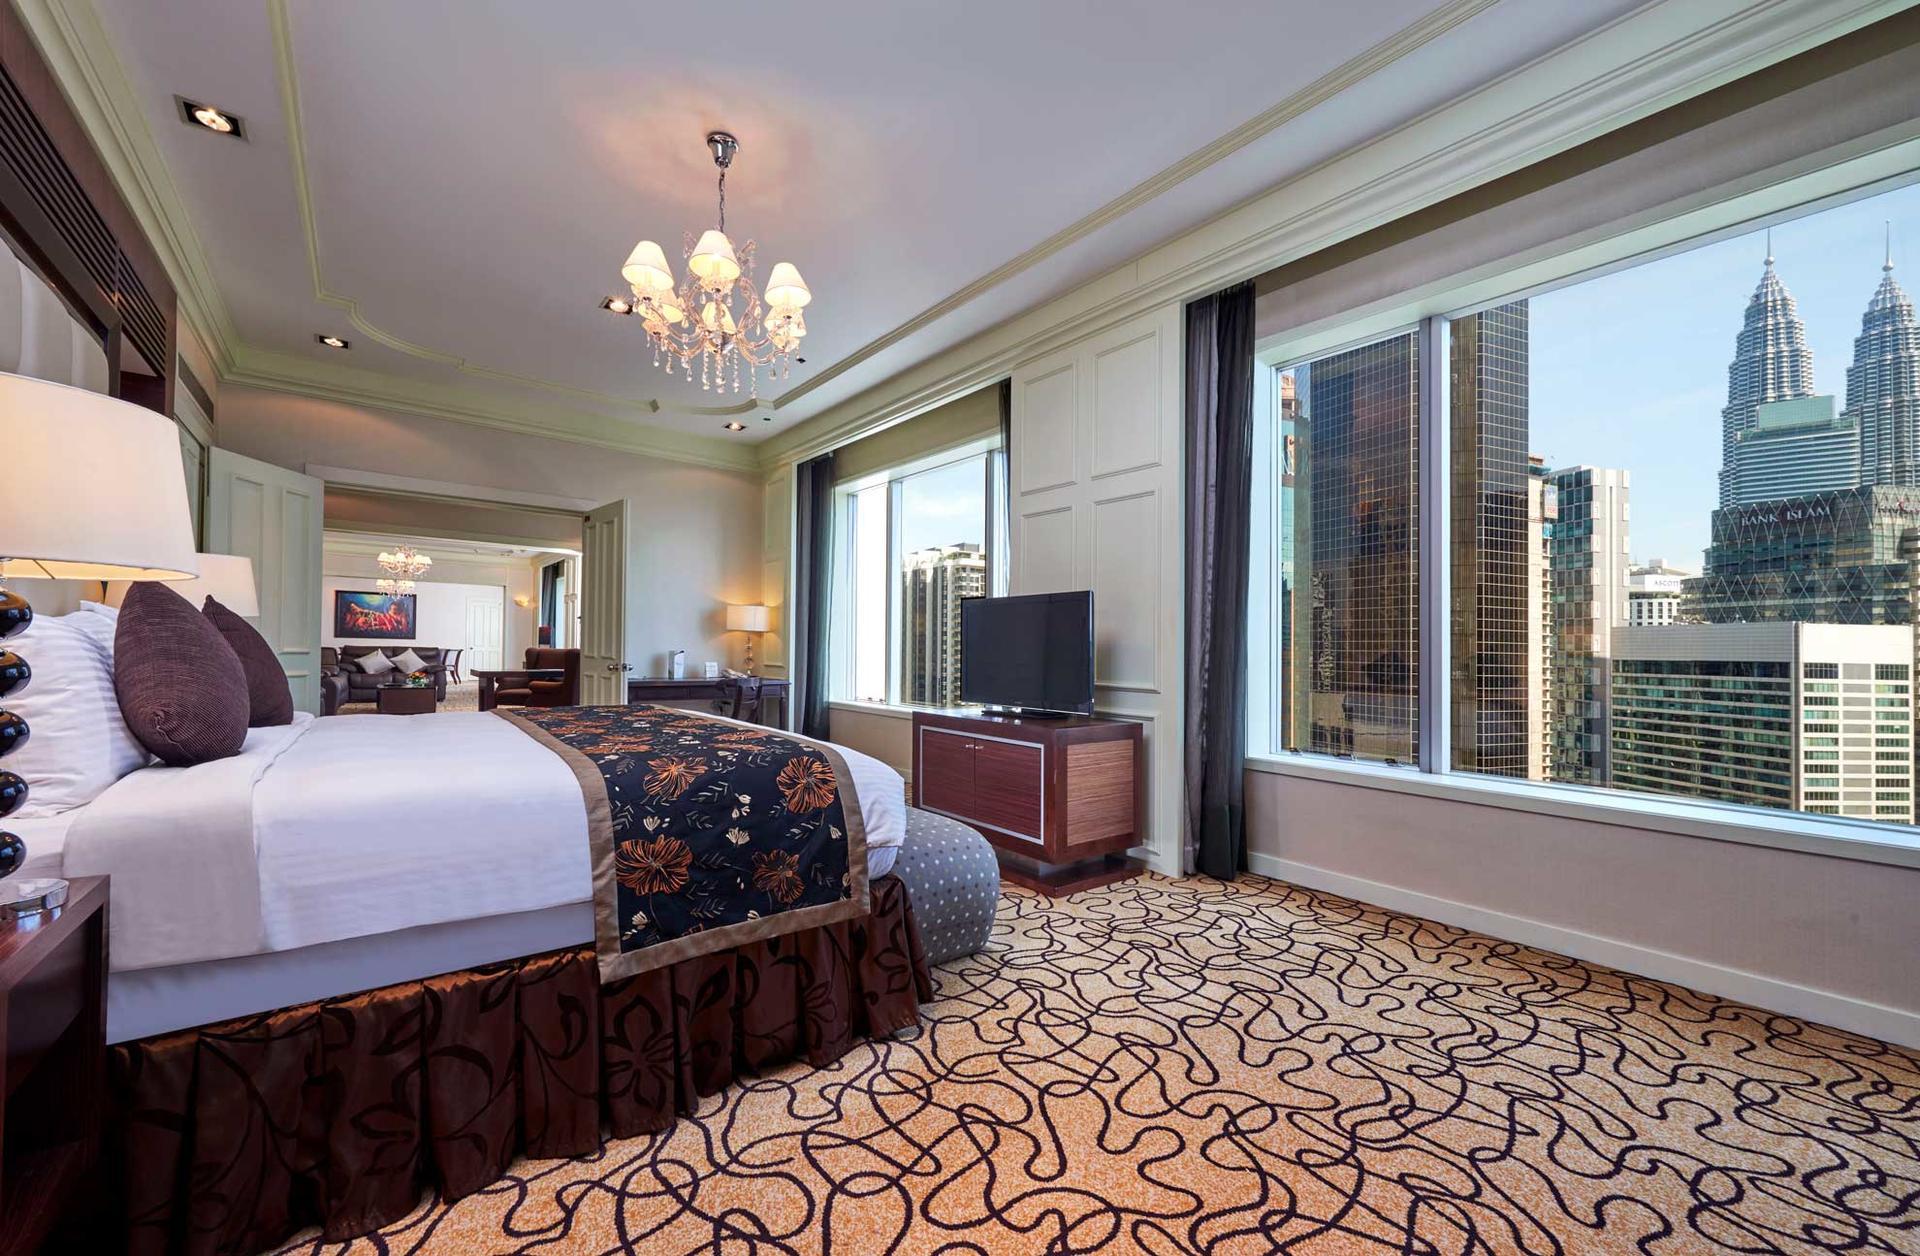 Hotel Istana Kuala Lumpur | 5-Star Hotel in Kuala Lumpur City Centre